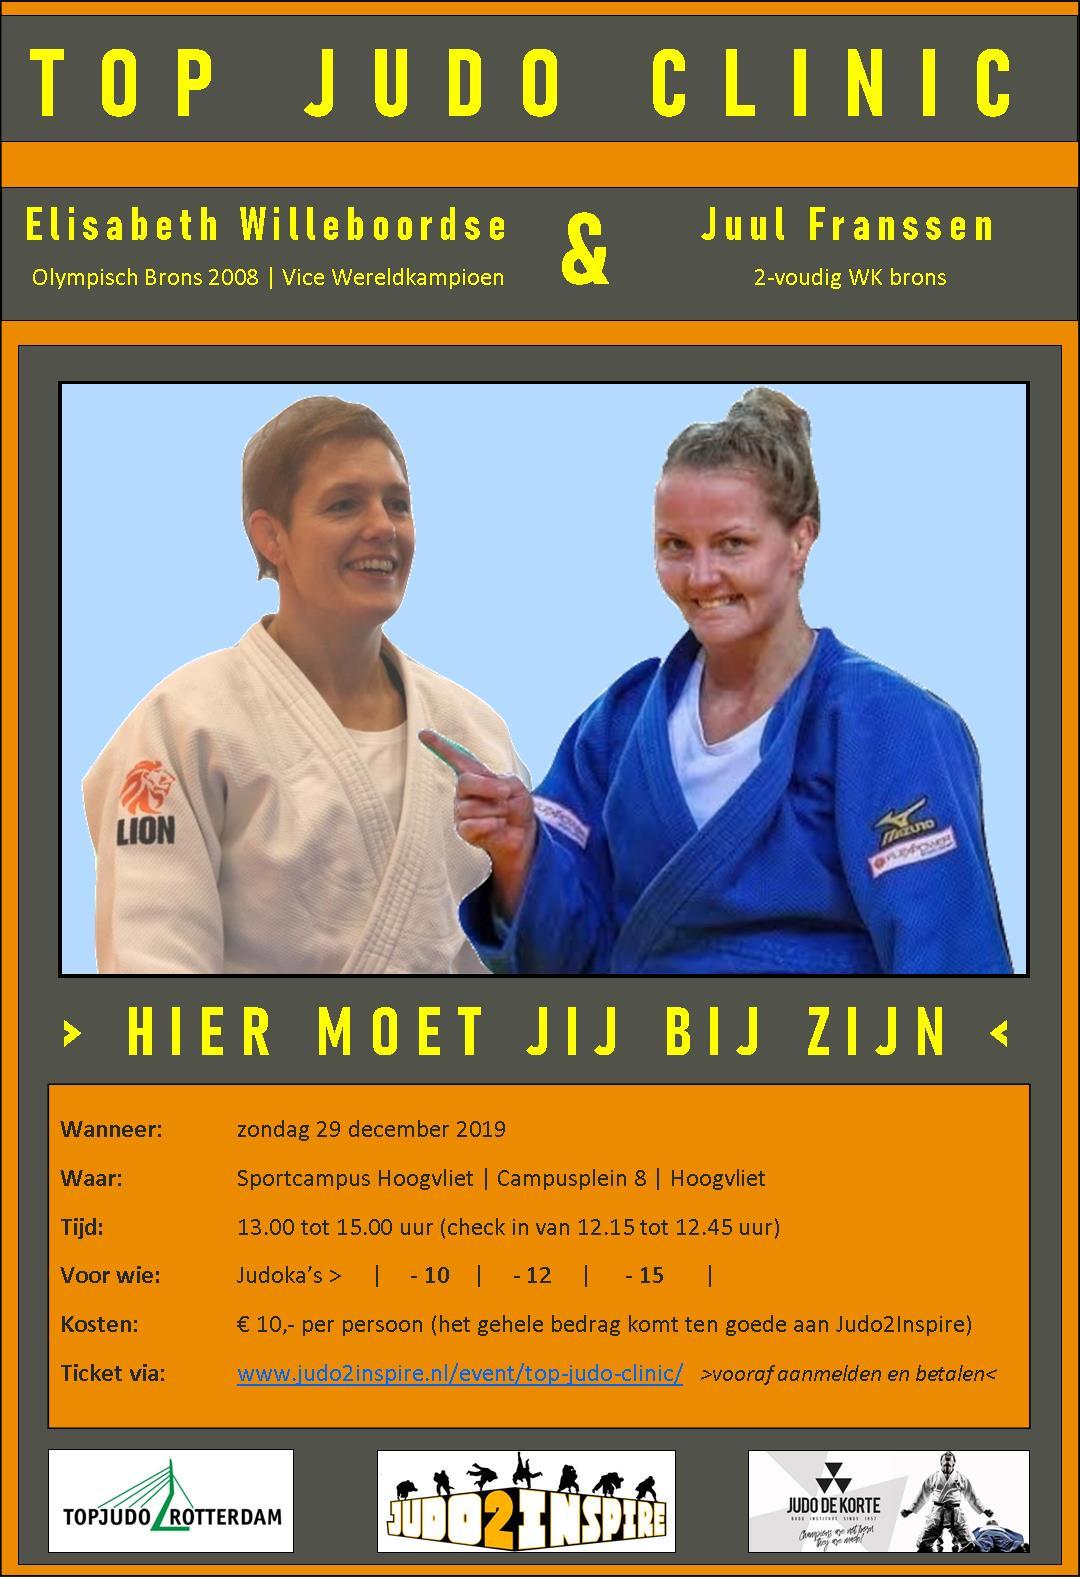 Top Judo Clinic